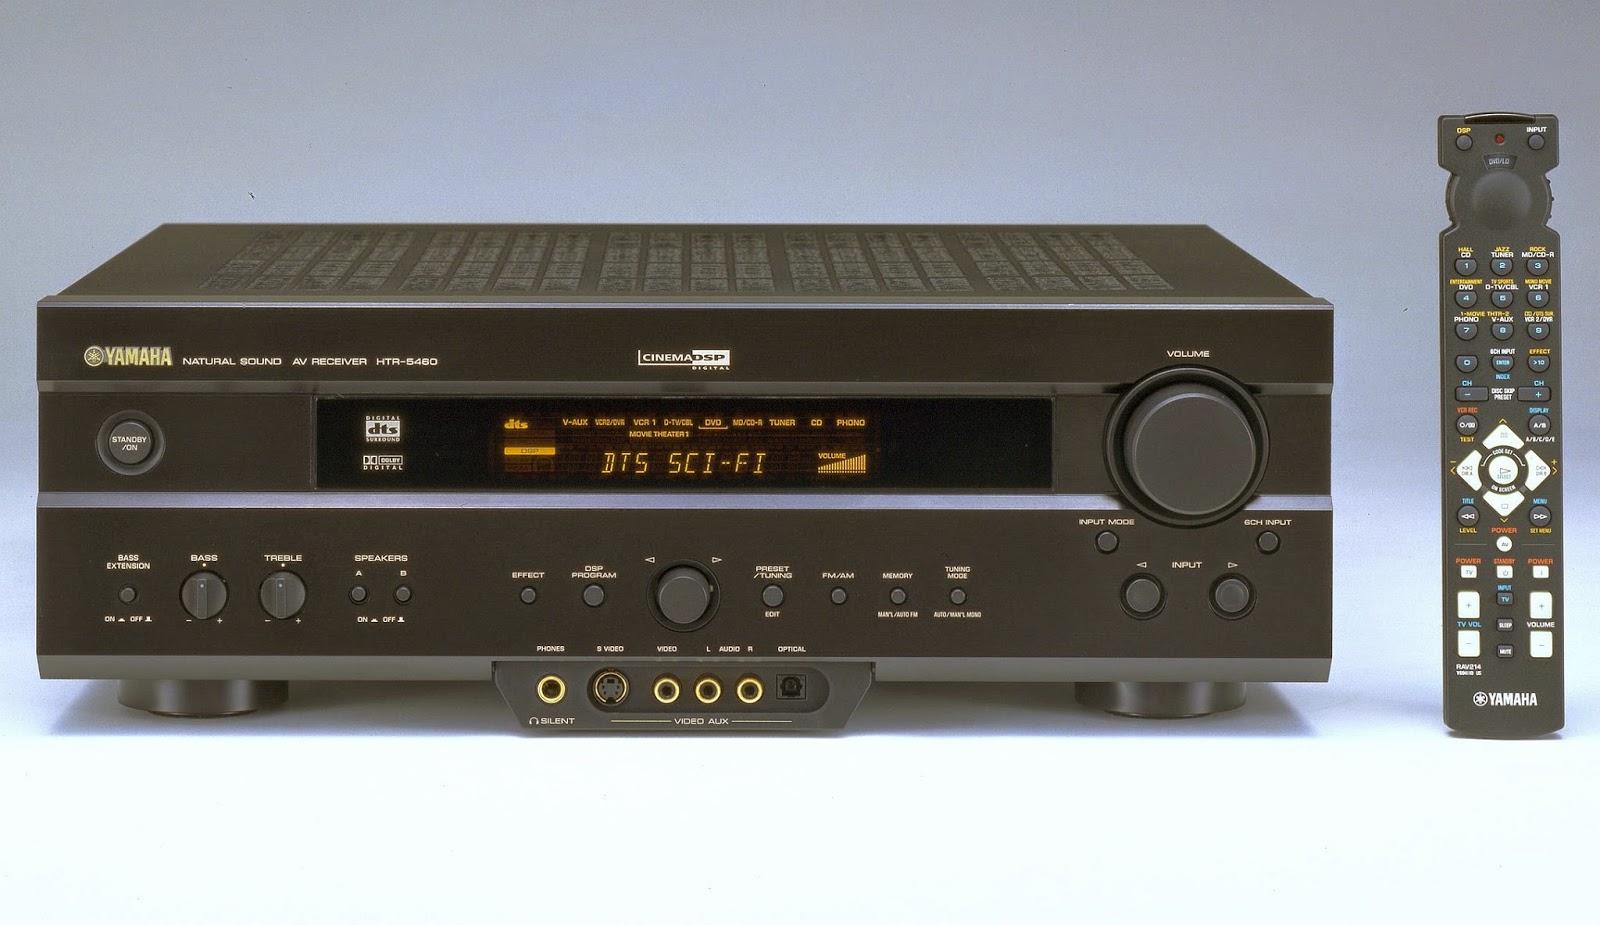 yamaha htr 5460 av receiver audiobaza rh audiobaza blogspot com yamaha htr-5460 service manual yamaha htr-5460 service manual